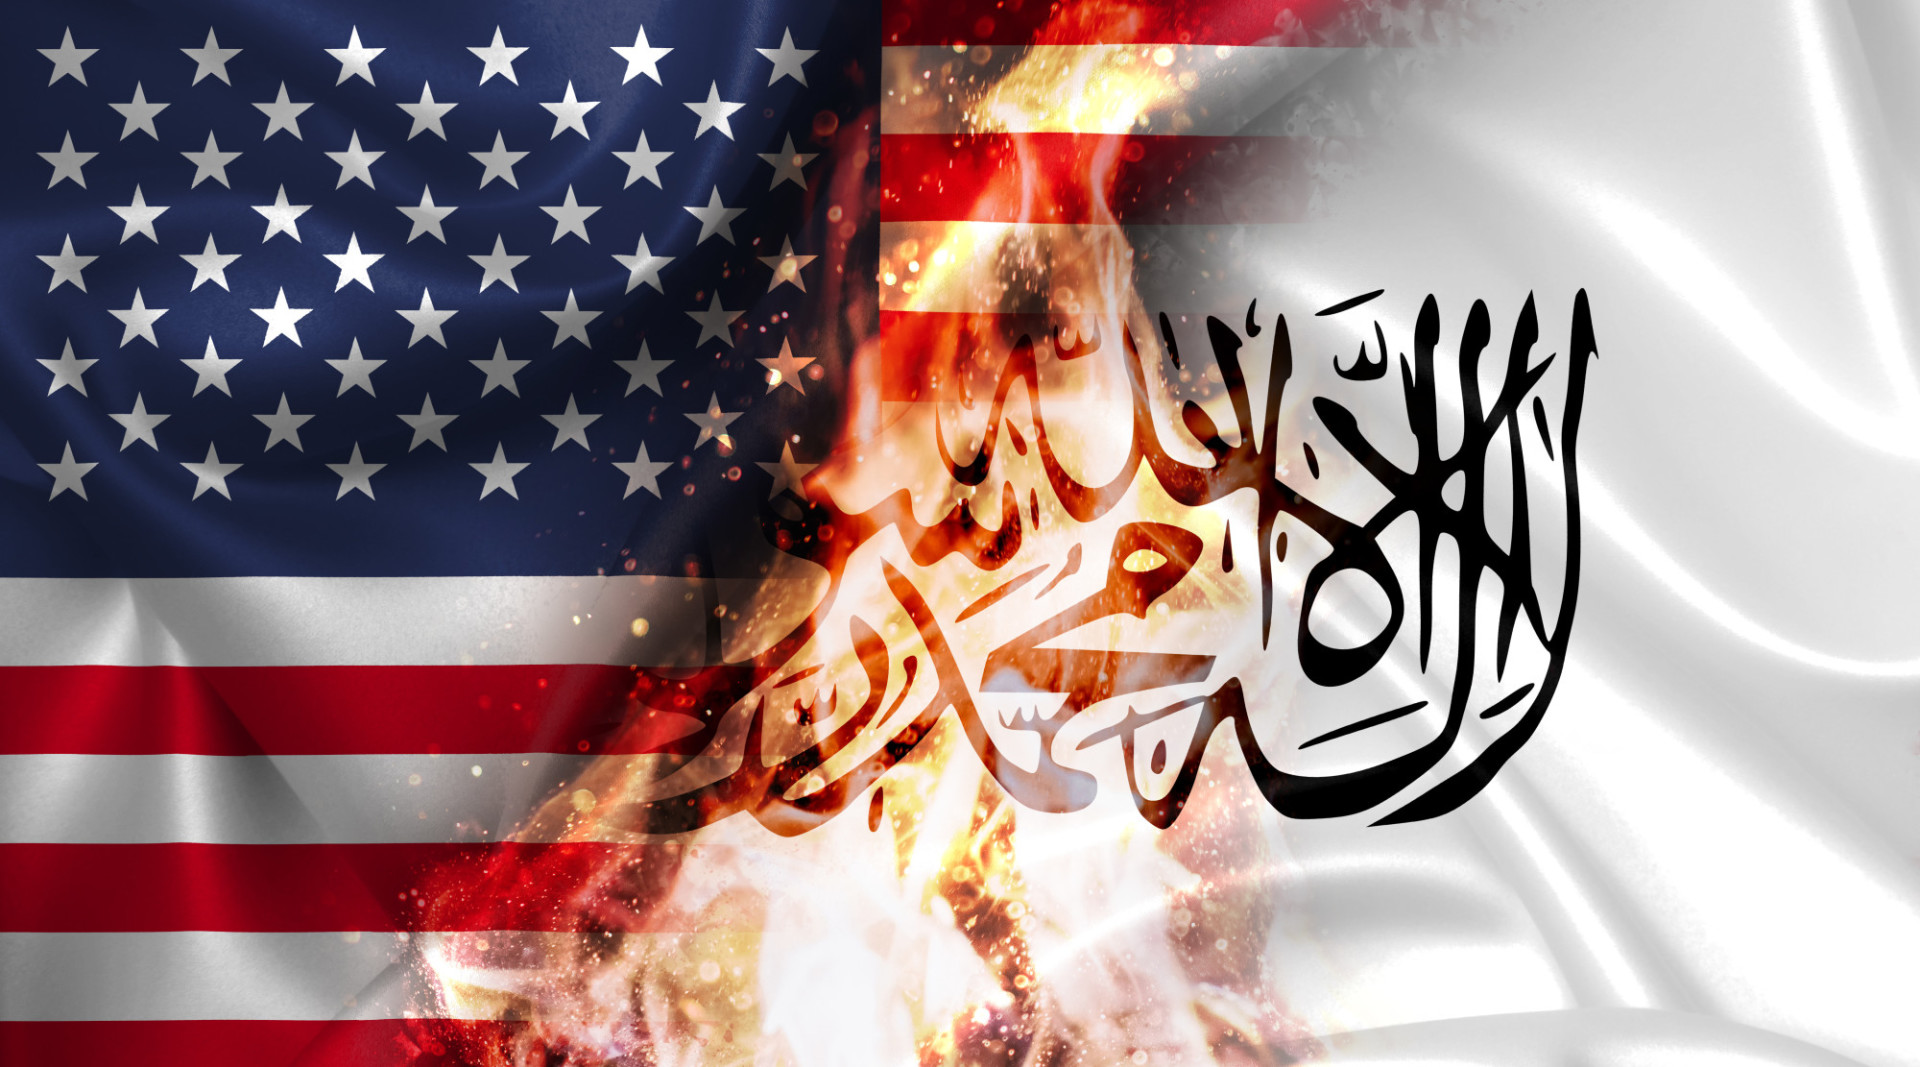 usa vs taliban